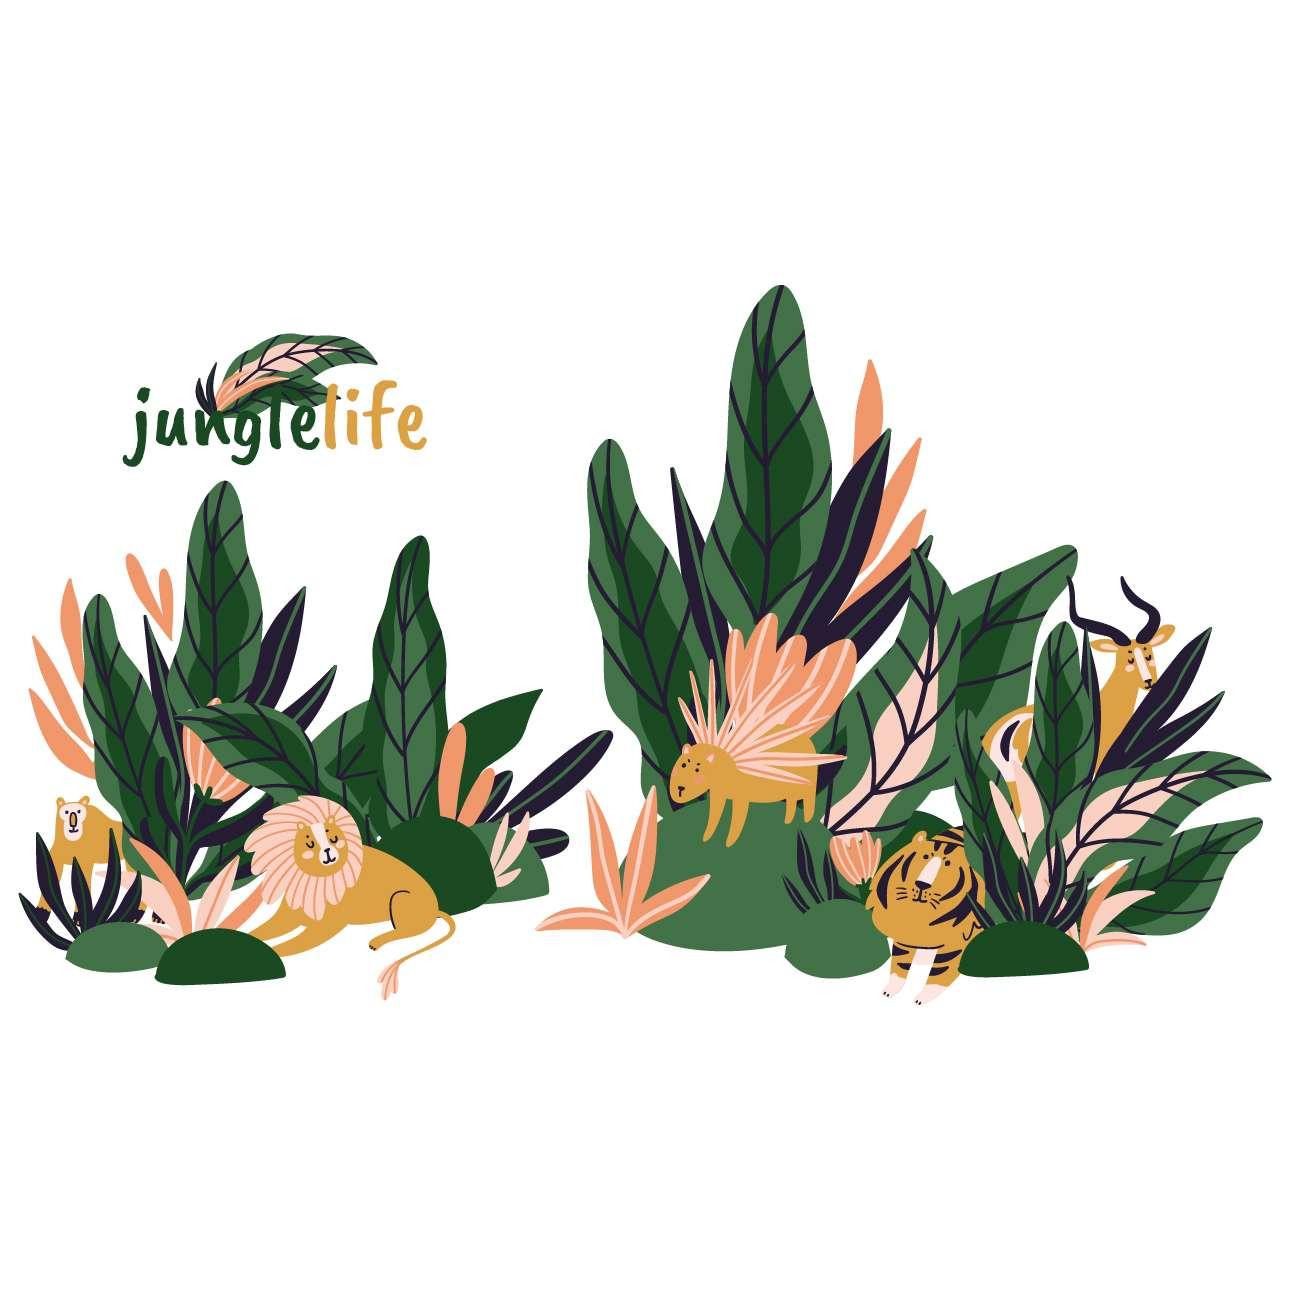 Aufkleber-Set Jungle Life